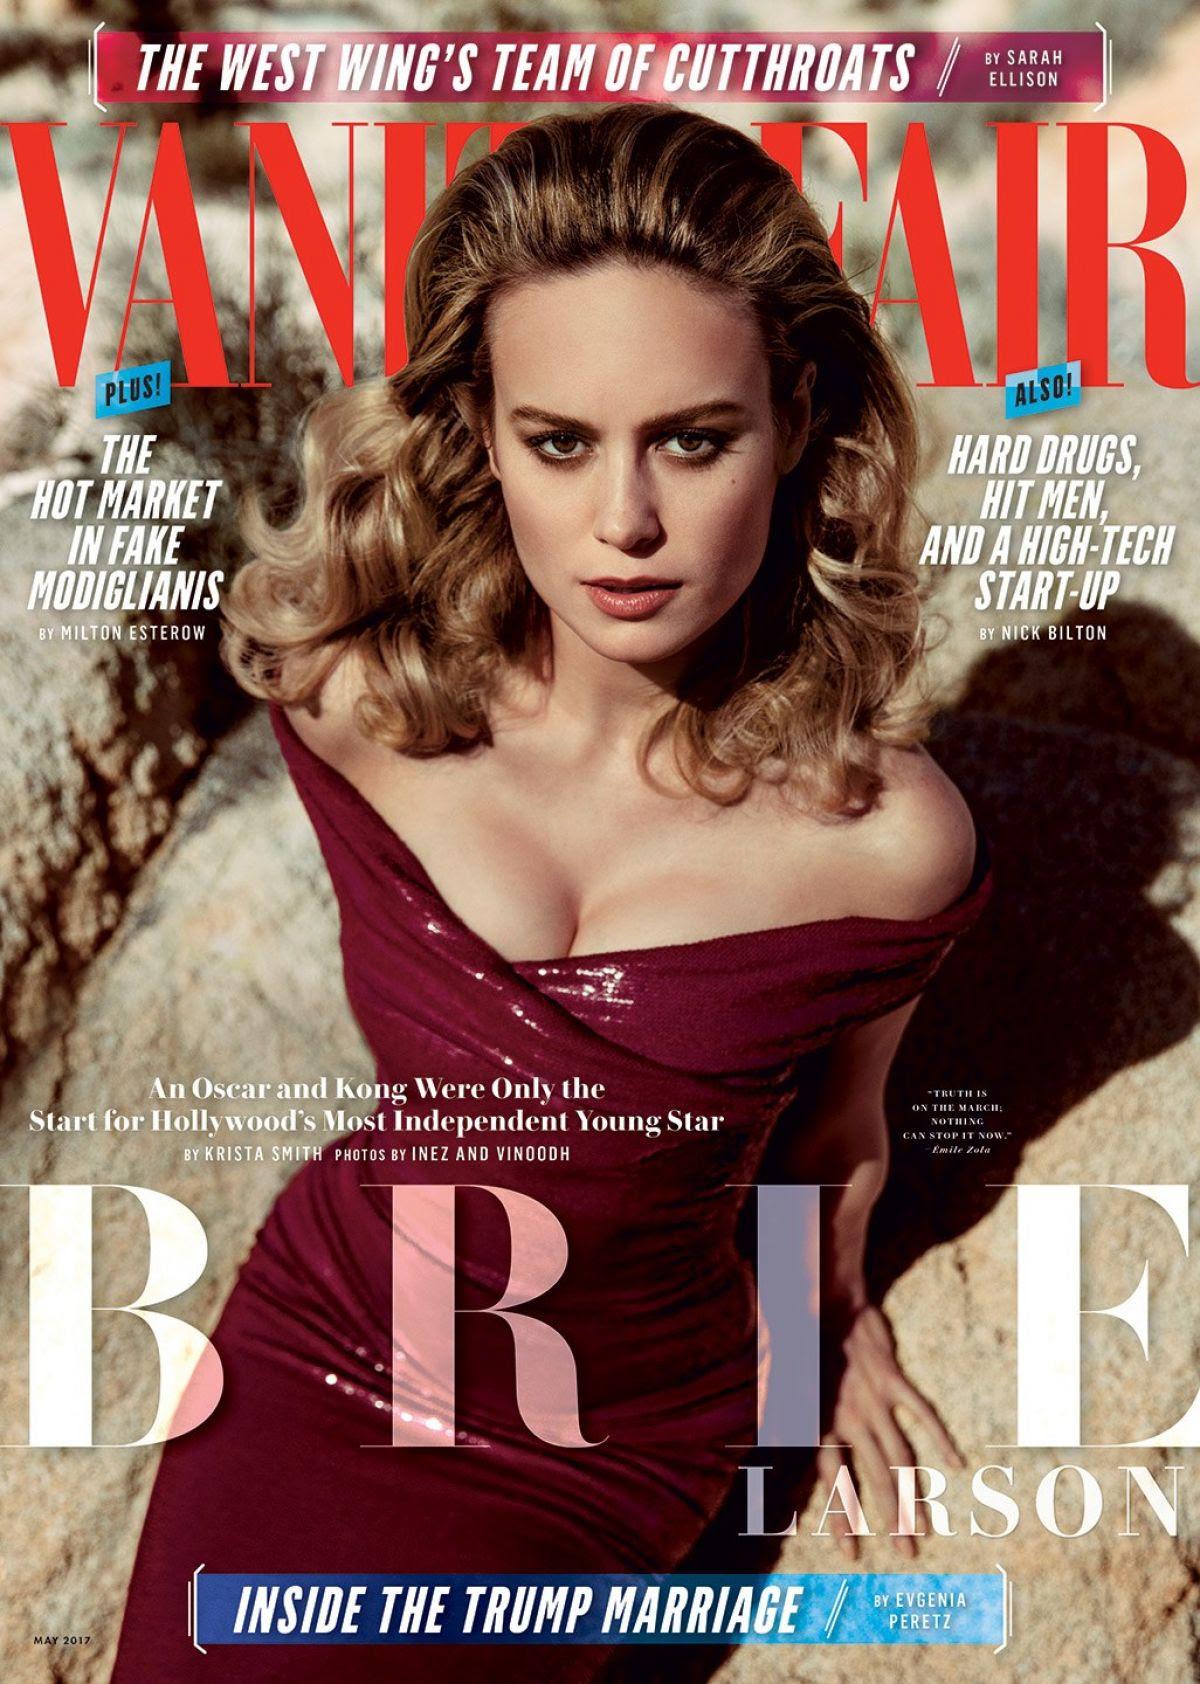 BRIE LARSON in Vanity Fair Magazine, May 2017